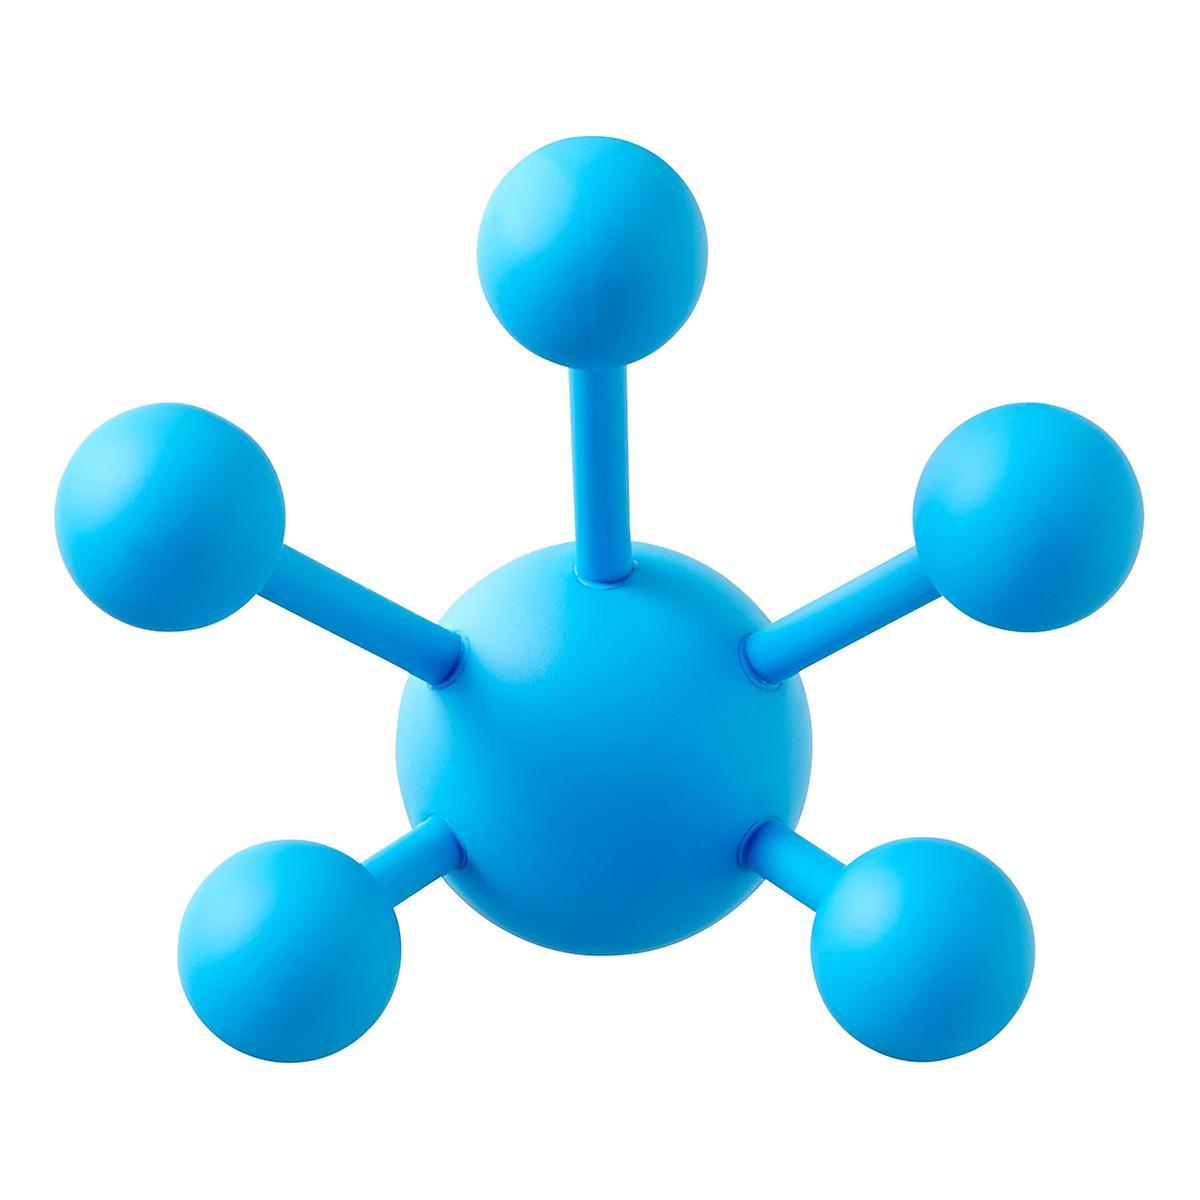 Atom clipart blue. Coat multi clip art